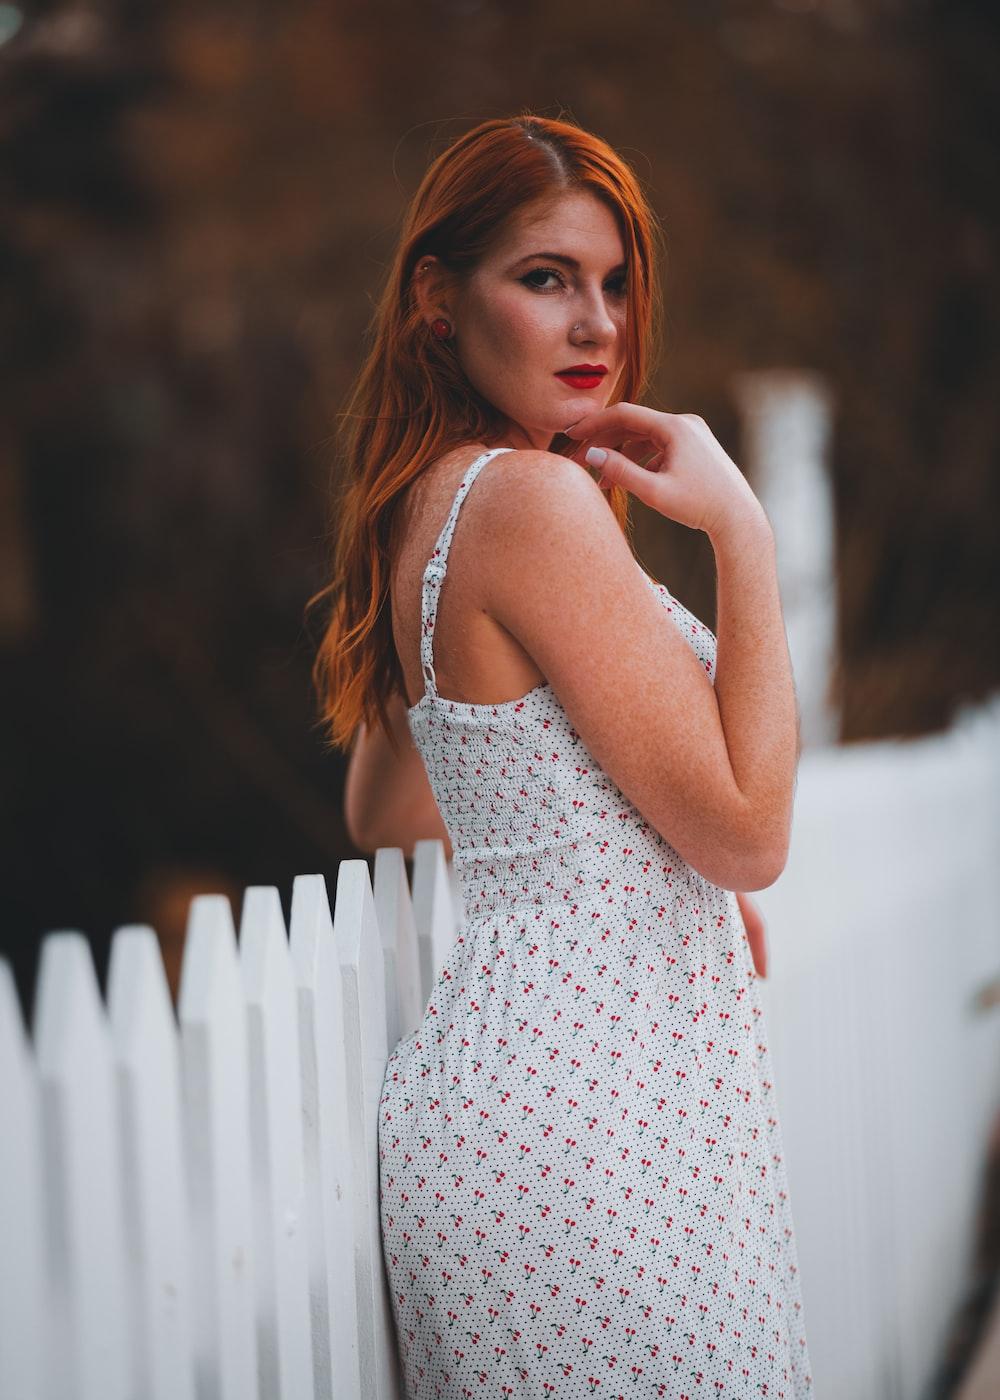 woman in white and black polka dot spaghetti strap dress